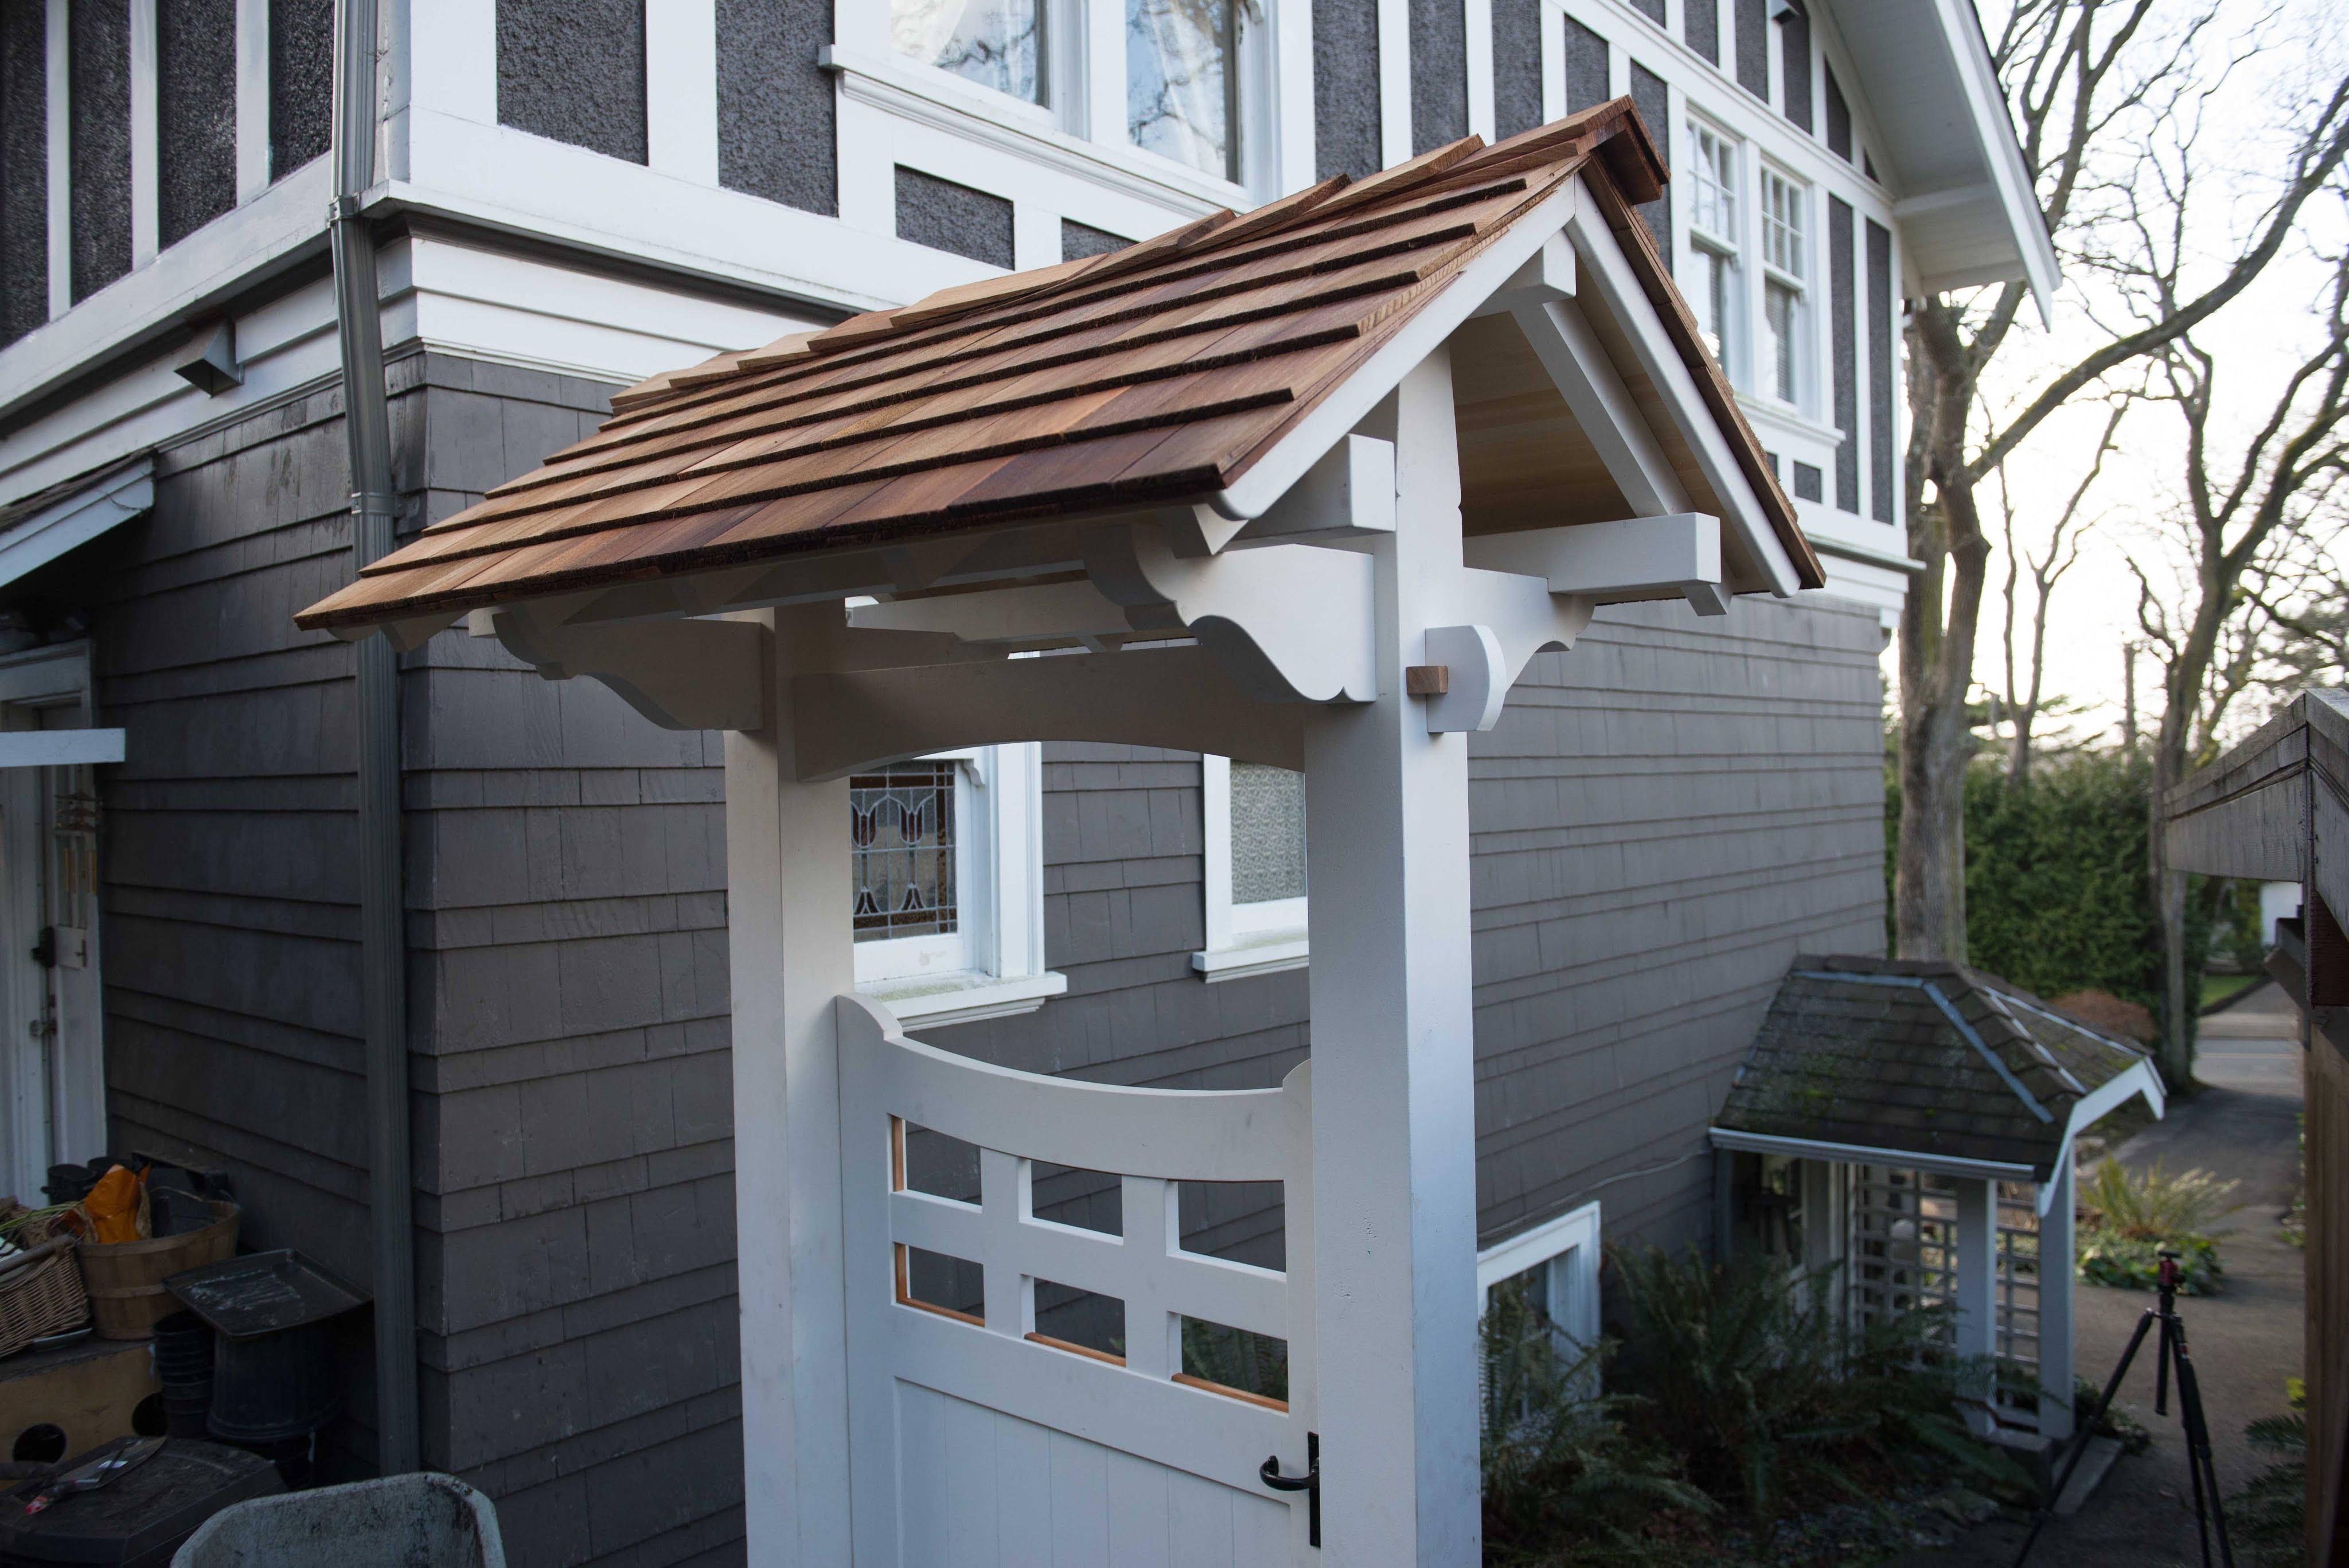 Building A Covered Gate Pt 2 The Samurai Carpenter